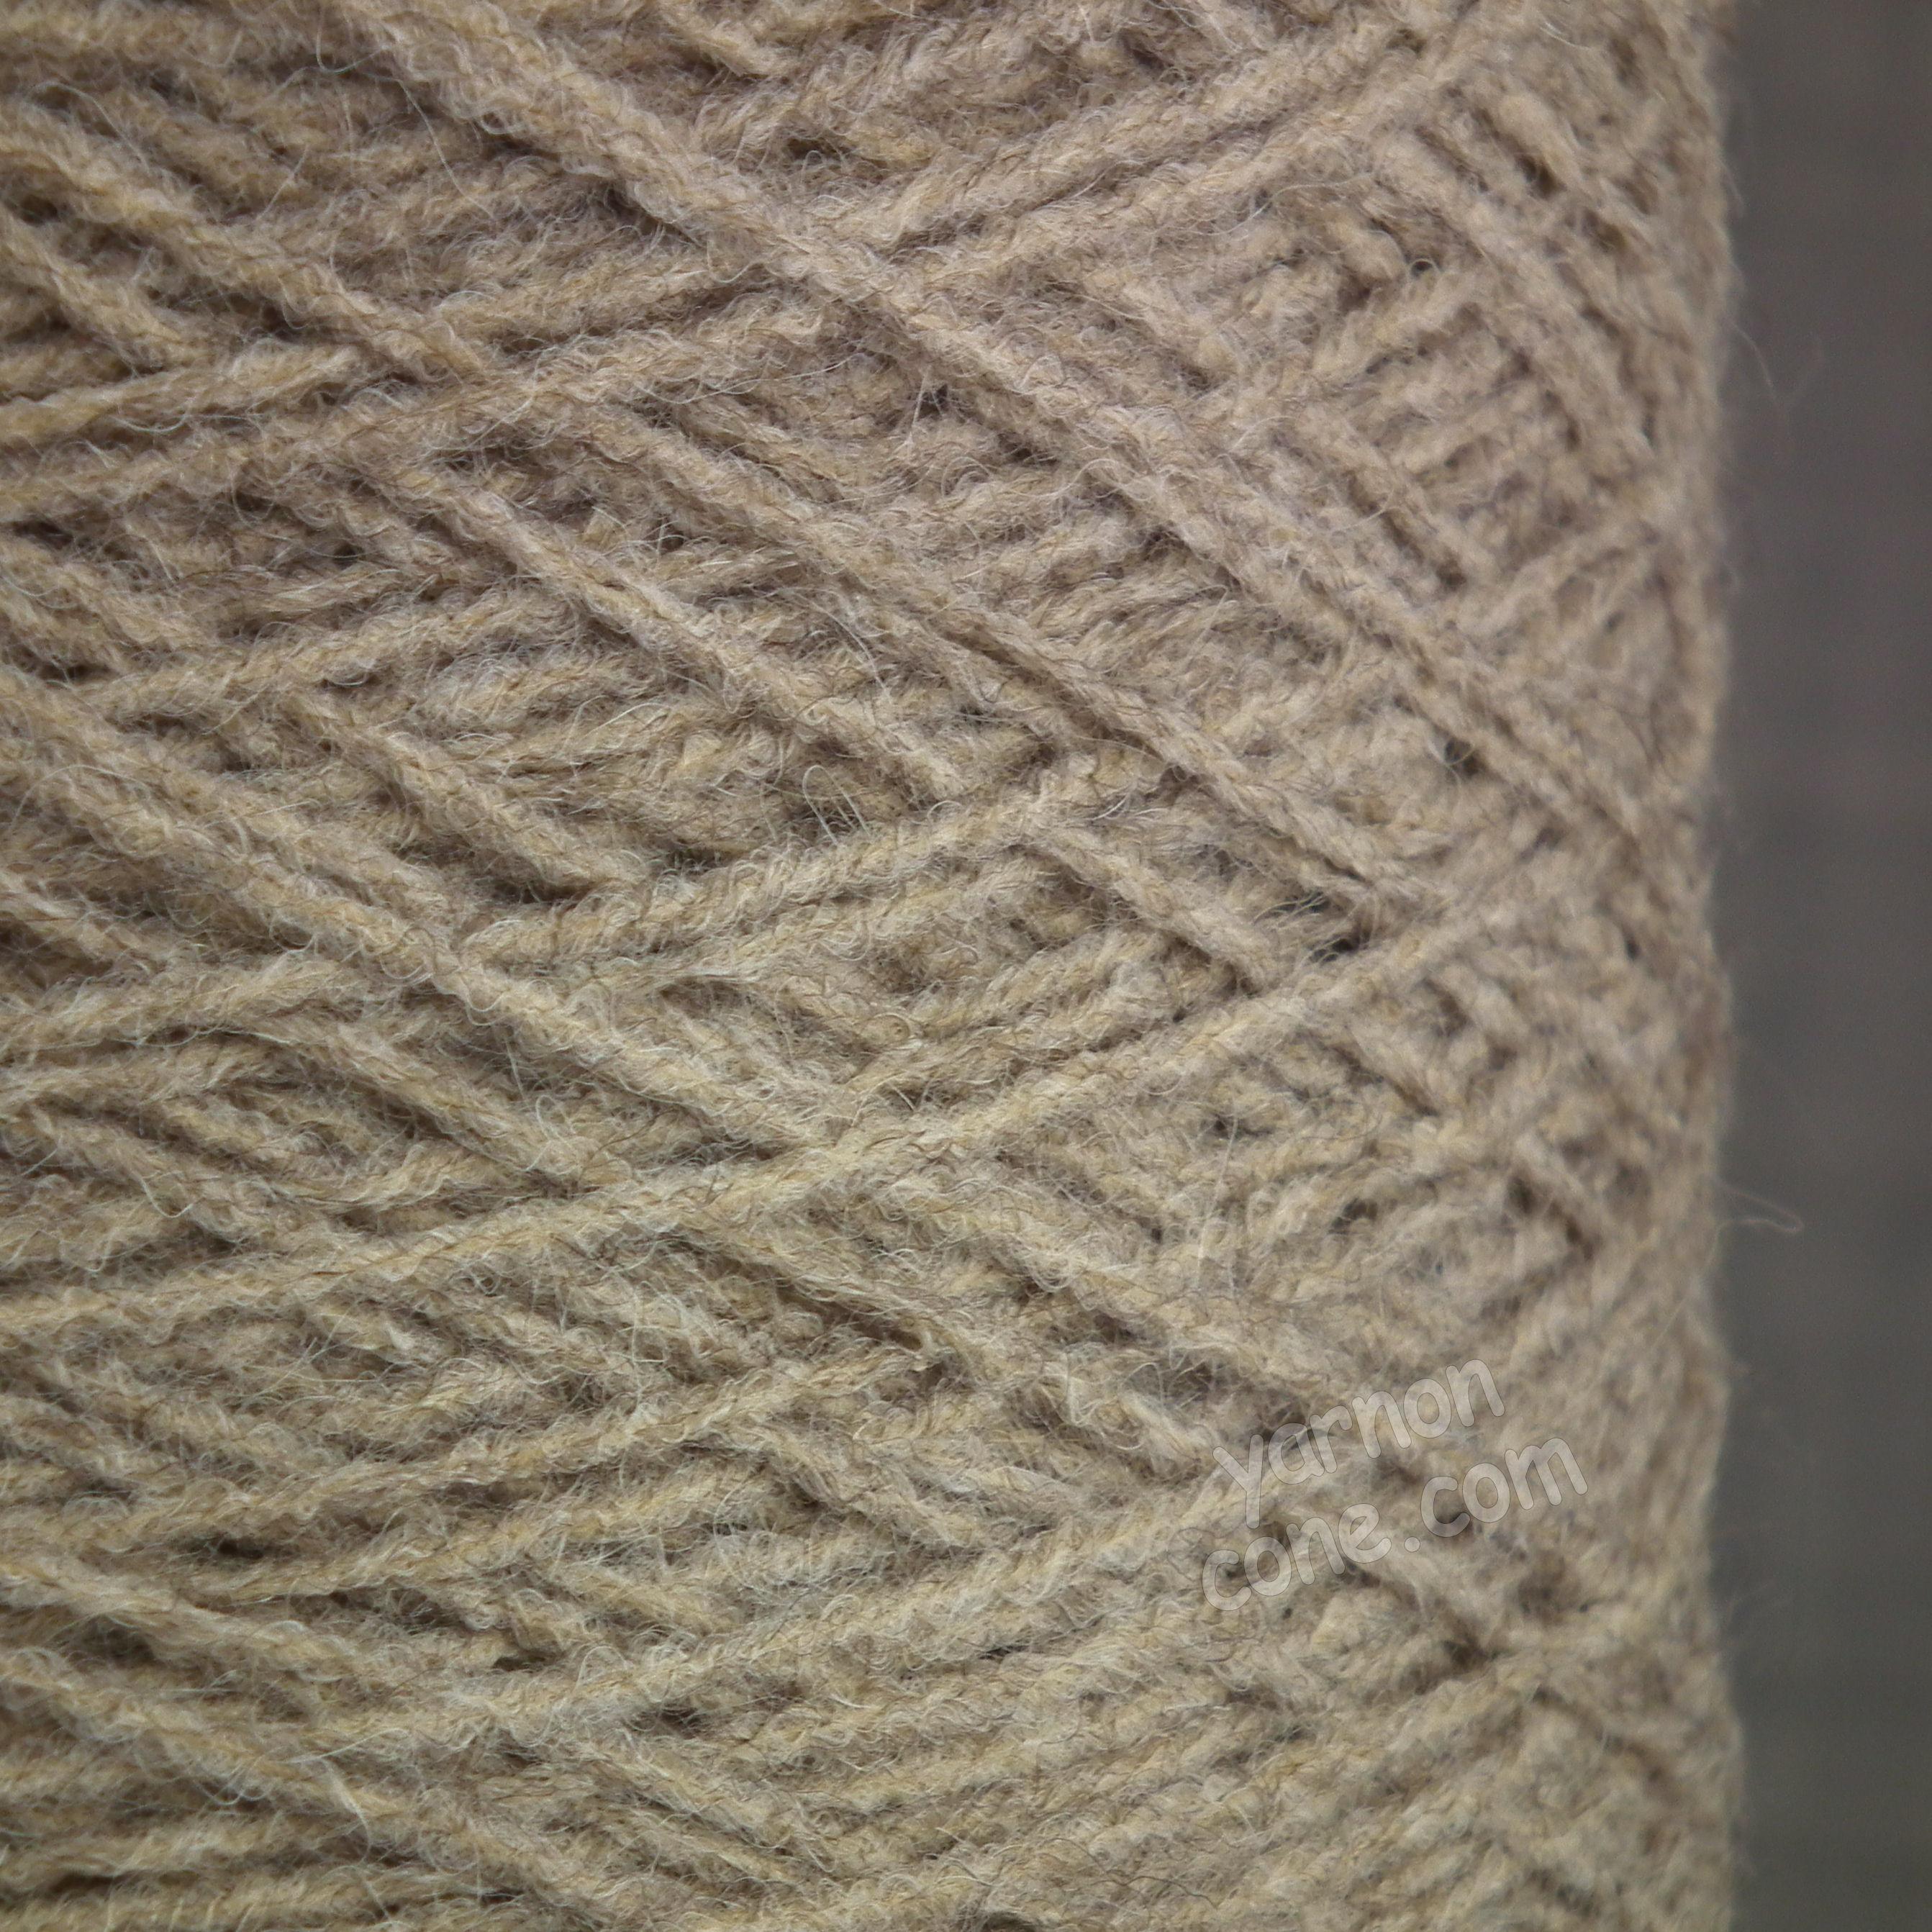 alpaca merino wool blend soft 4 ply hand and machine knitting yarn on cone uk light taupe brown